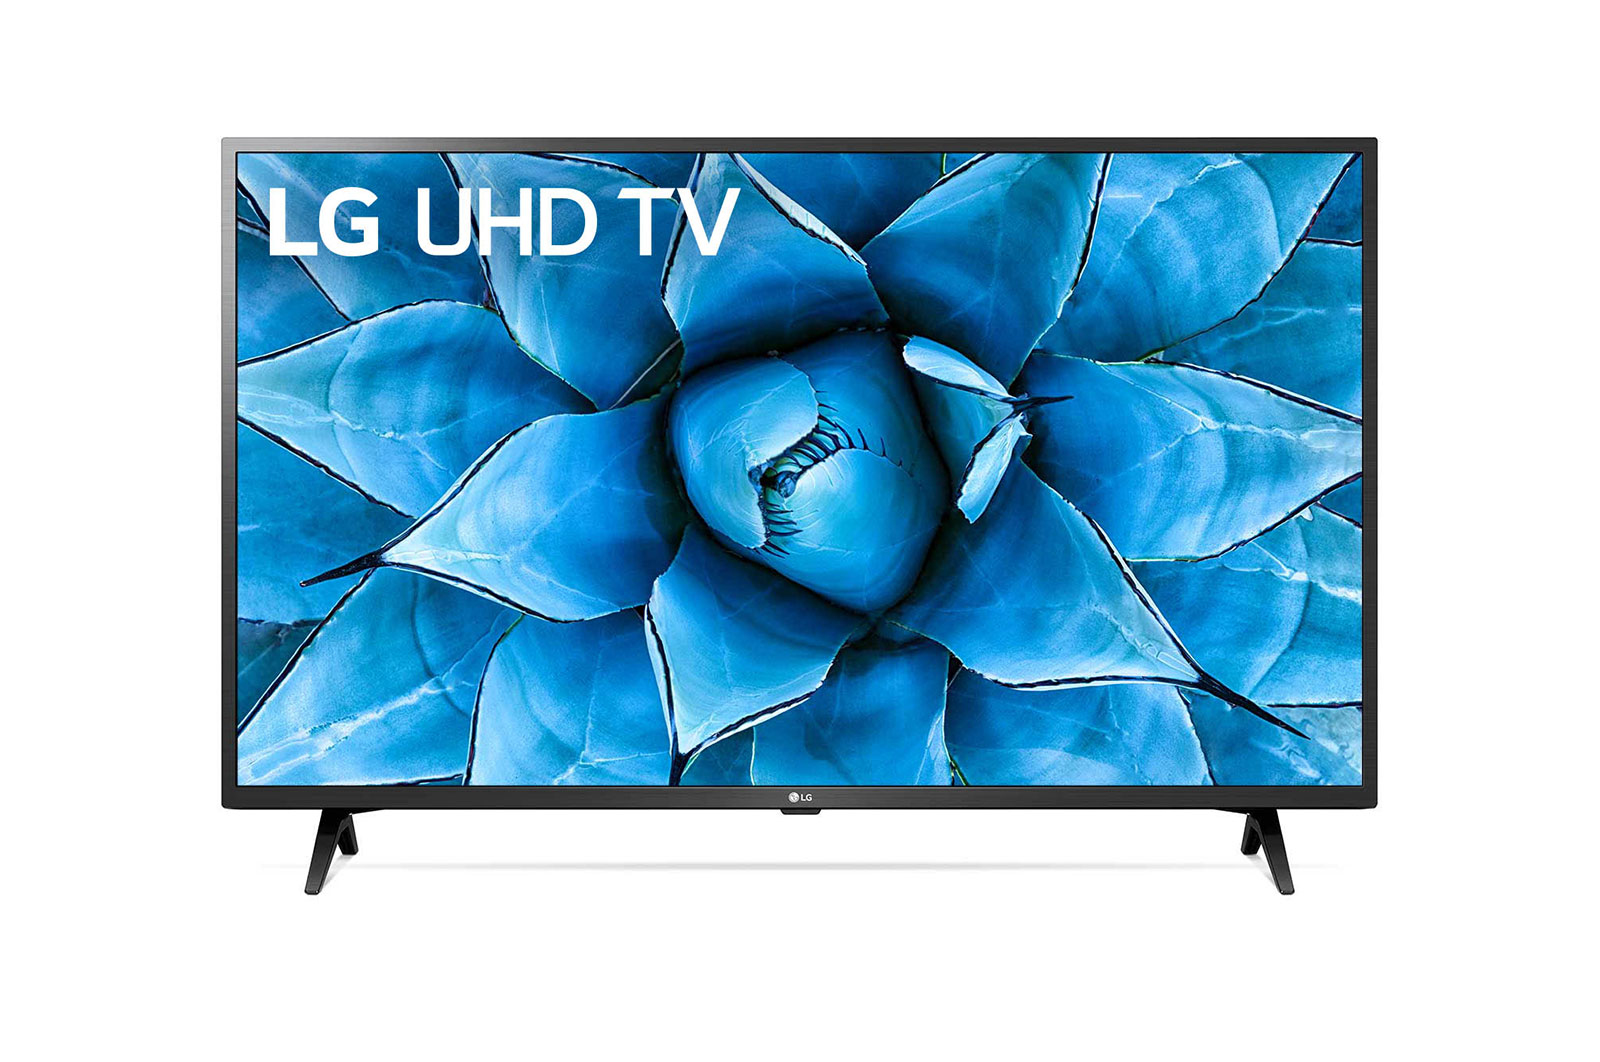 LG 43UN73006LC TV 109.2 cm (43